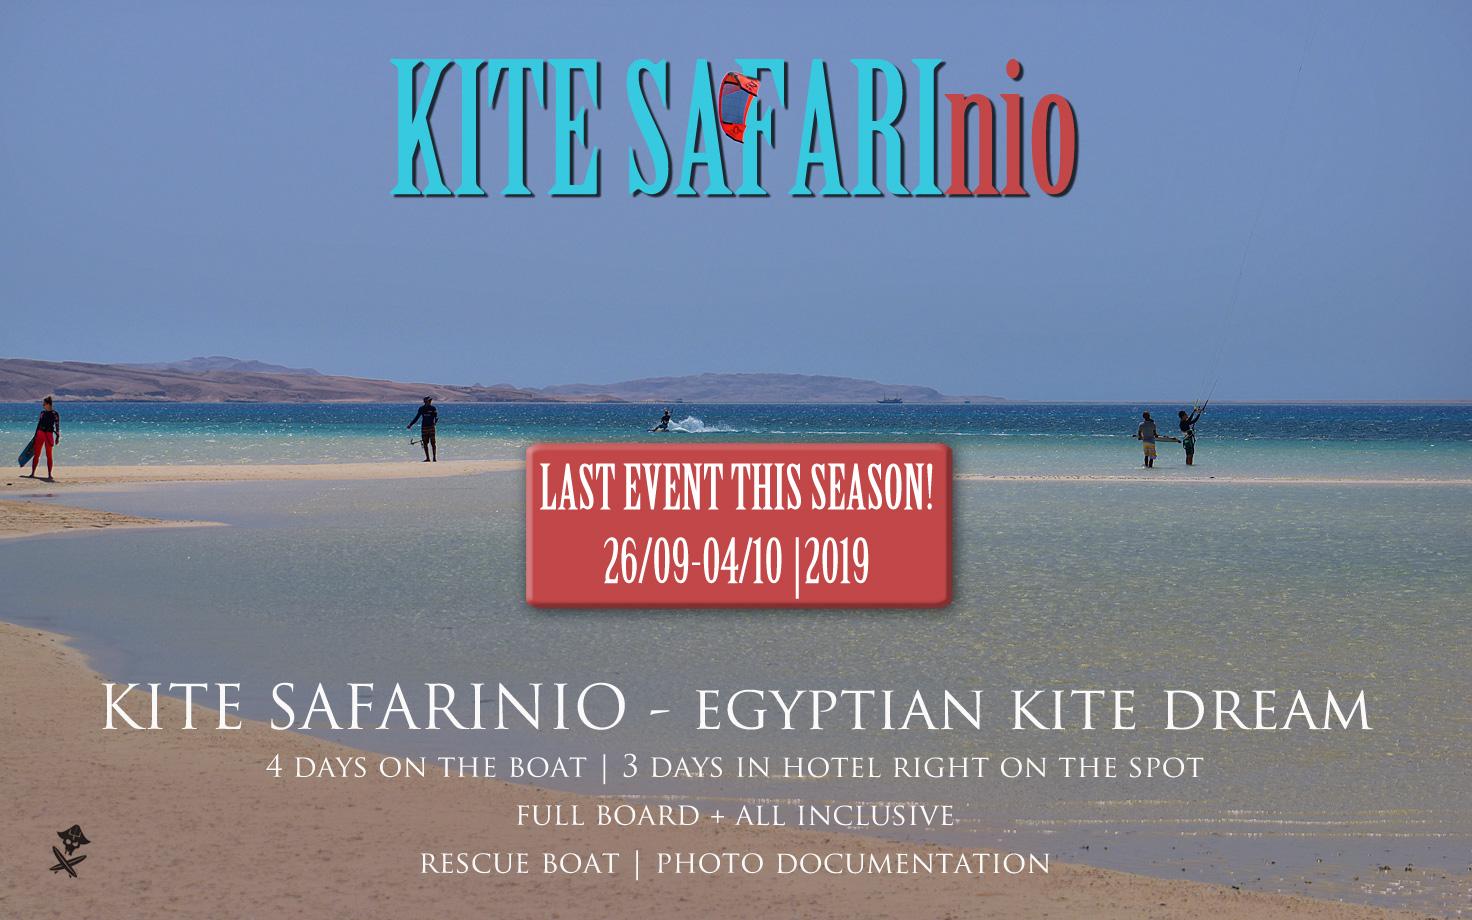 kite safari egipt wyjazdy jacht raj